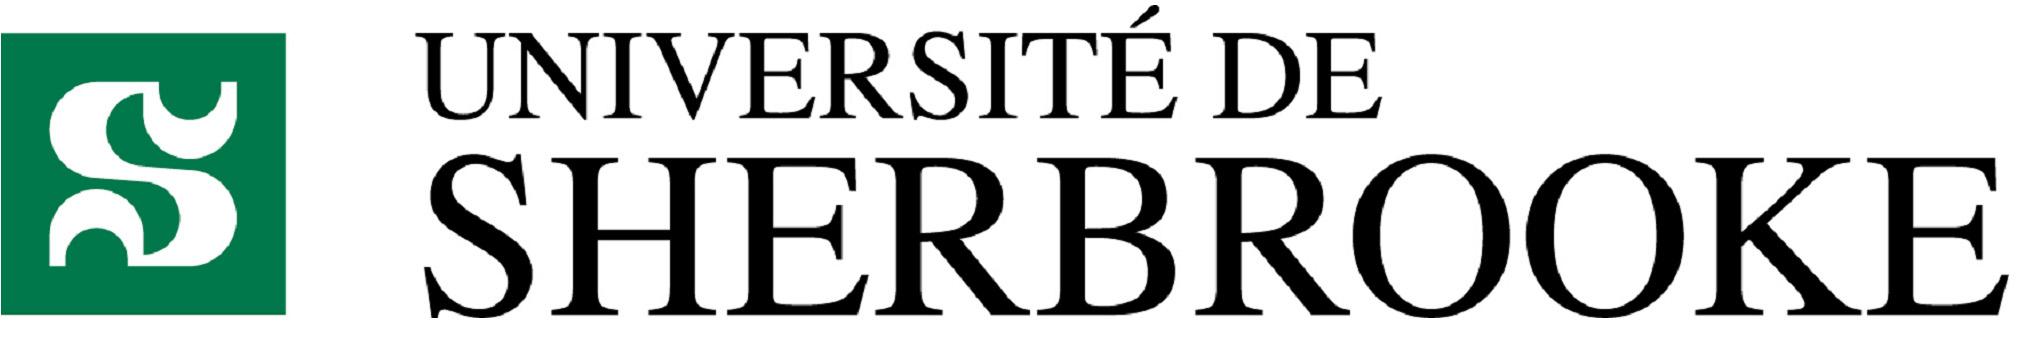 Universit� de Sherbrooke